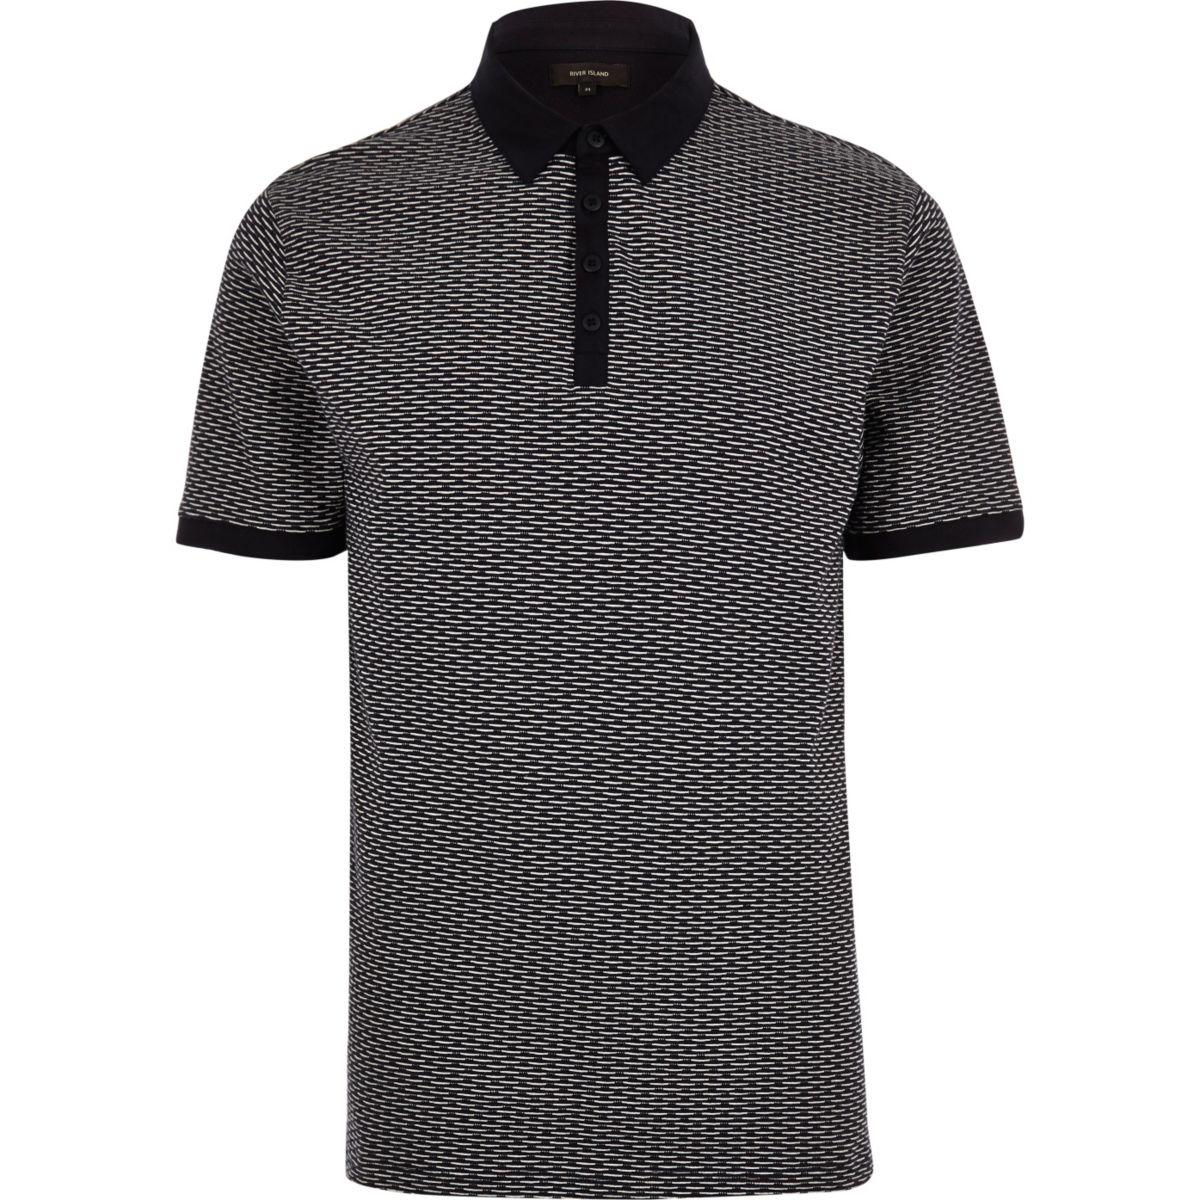 Navy jacquard polo shirt